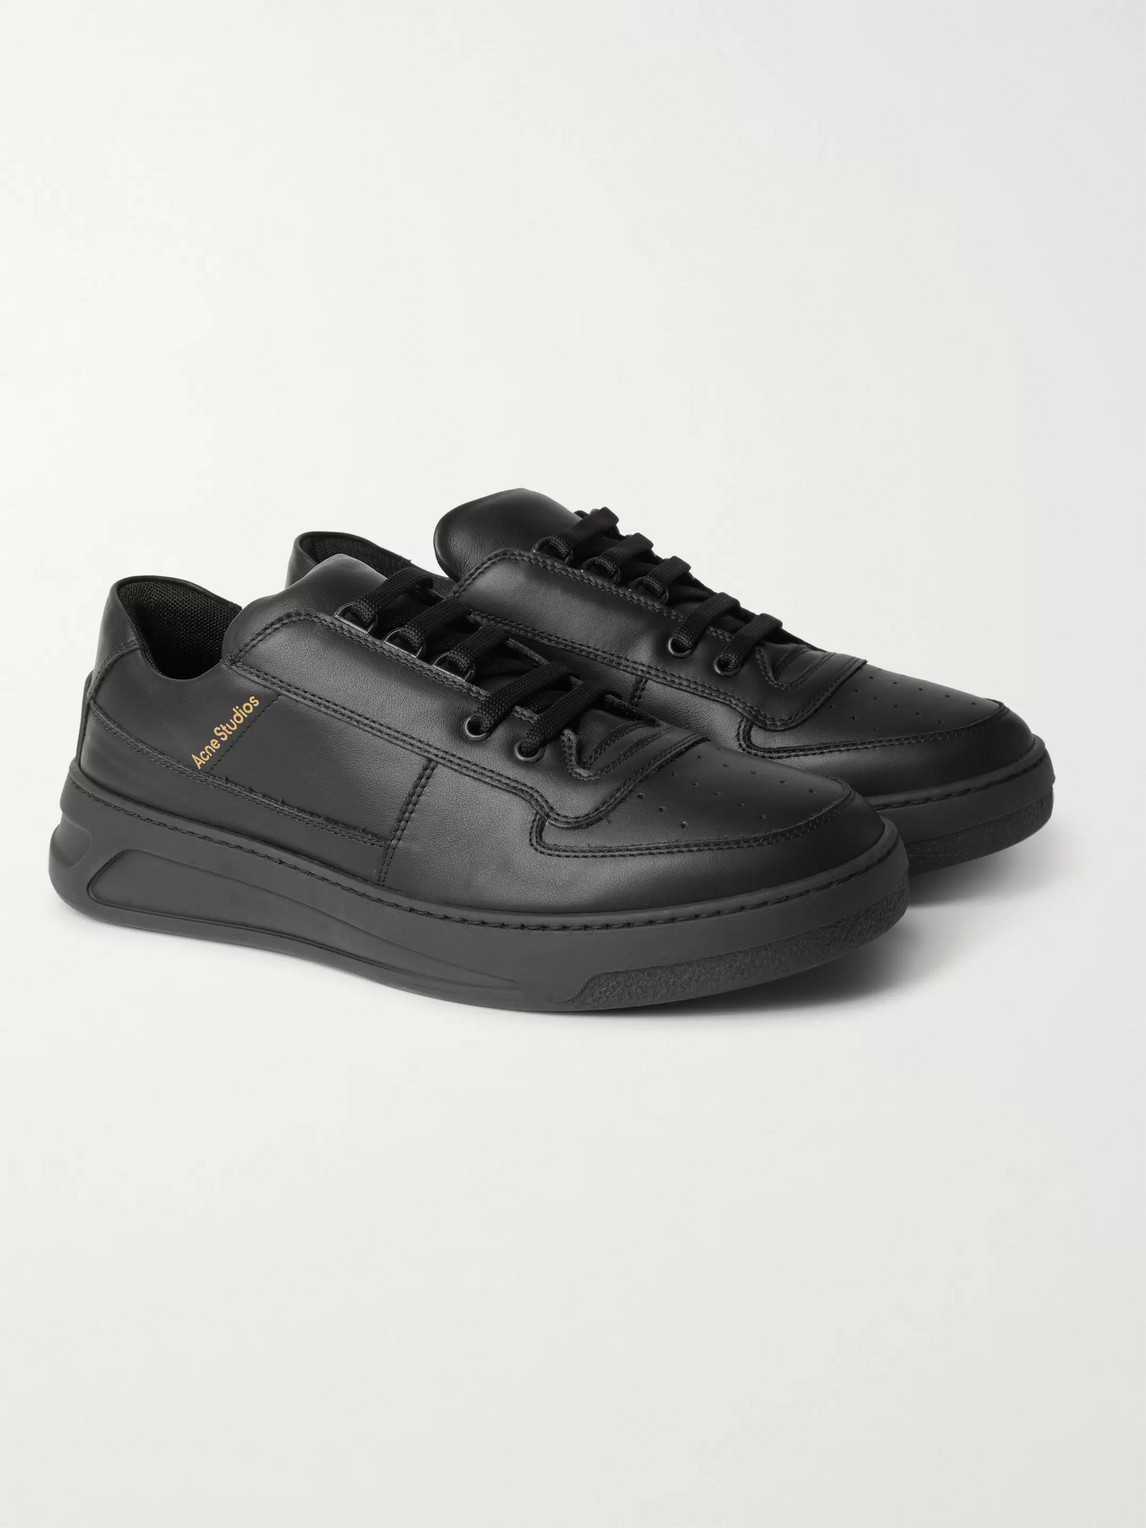 acne studios - leather sneakers - men - black